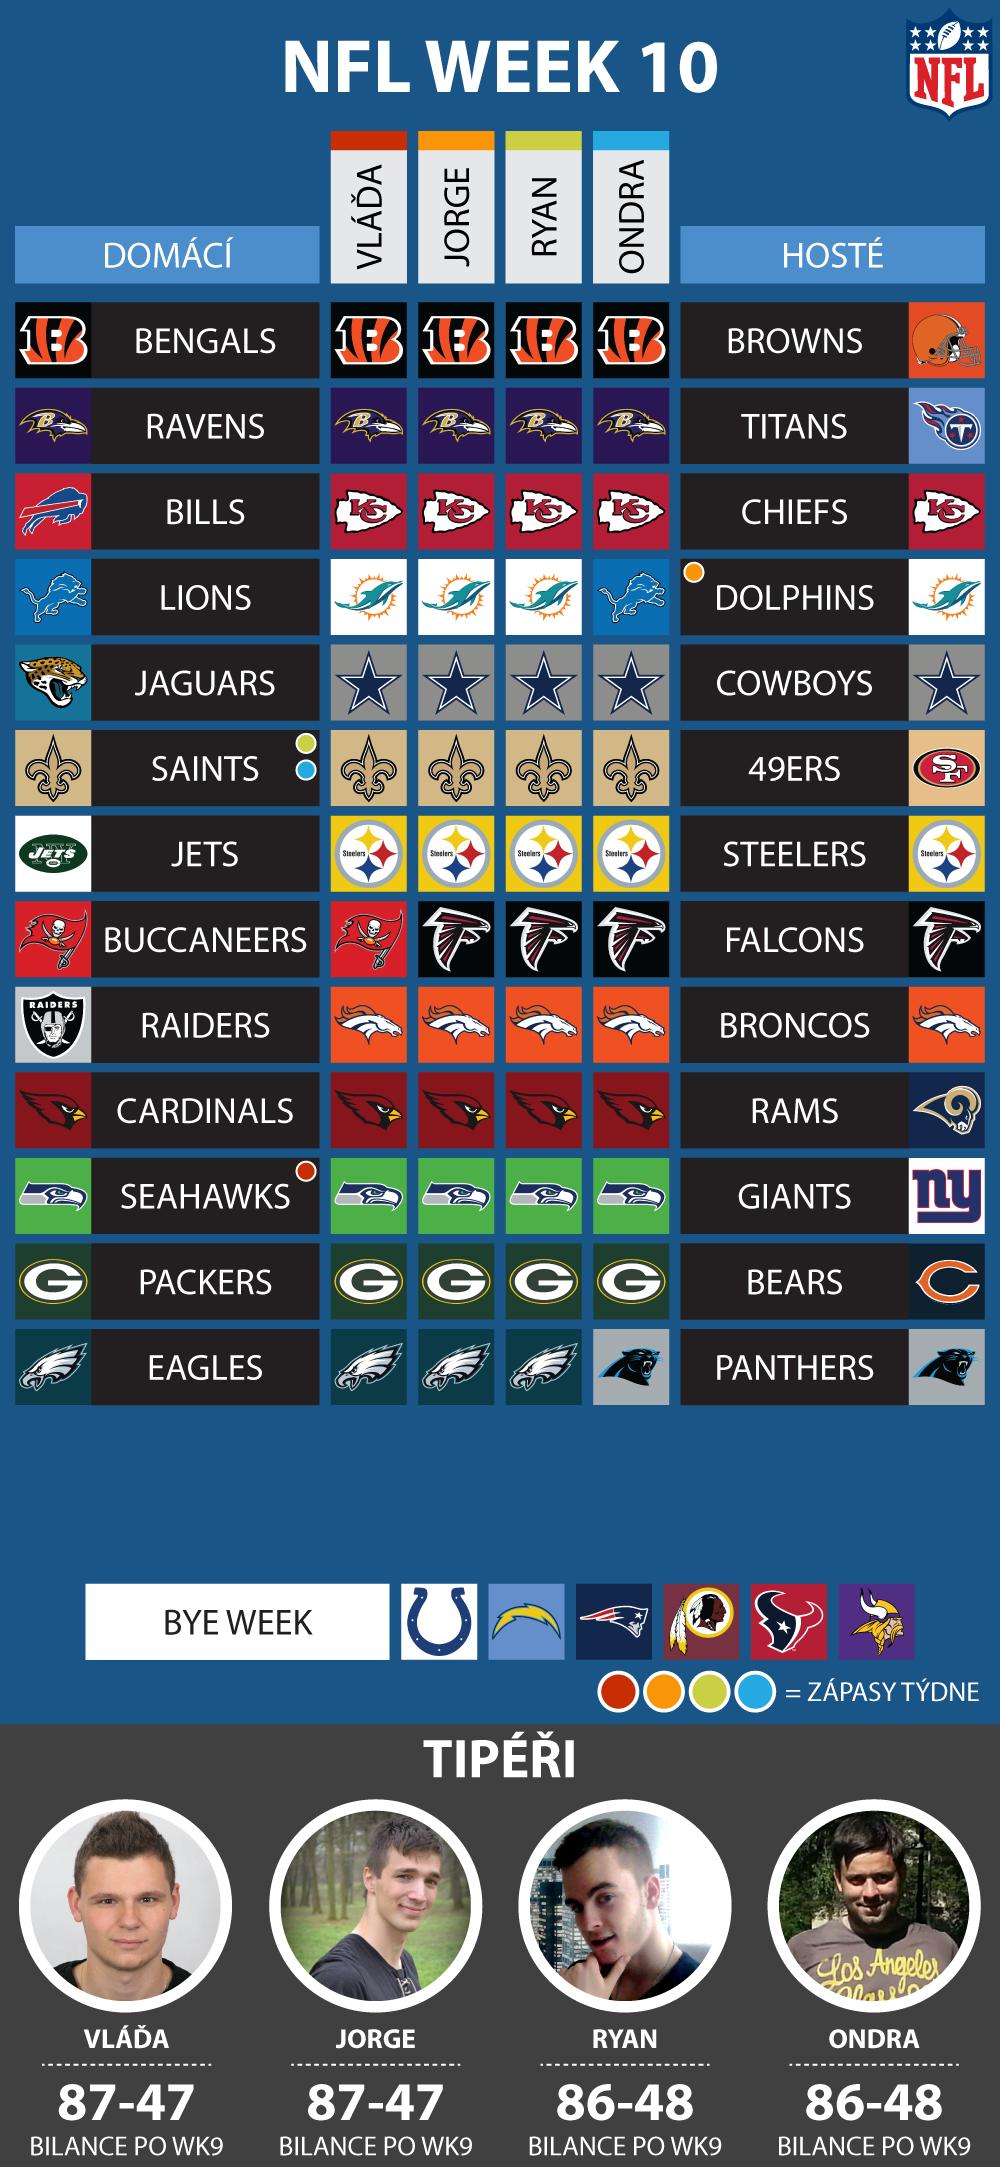 NFLTipy_Week10